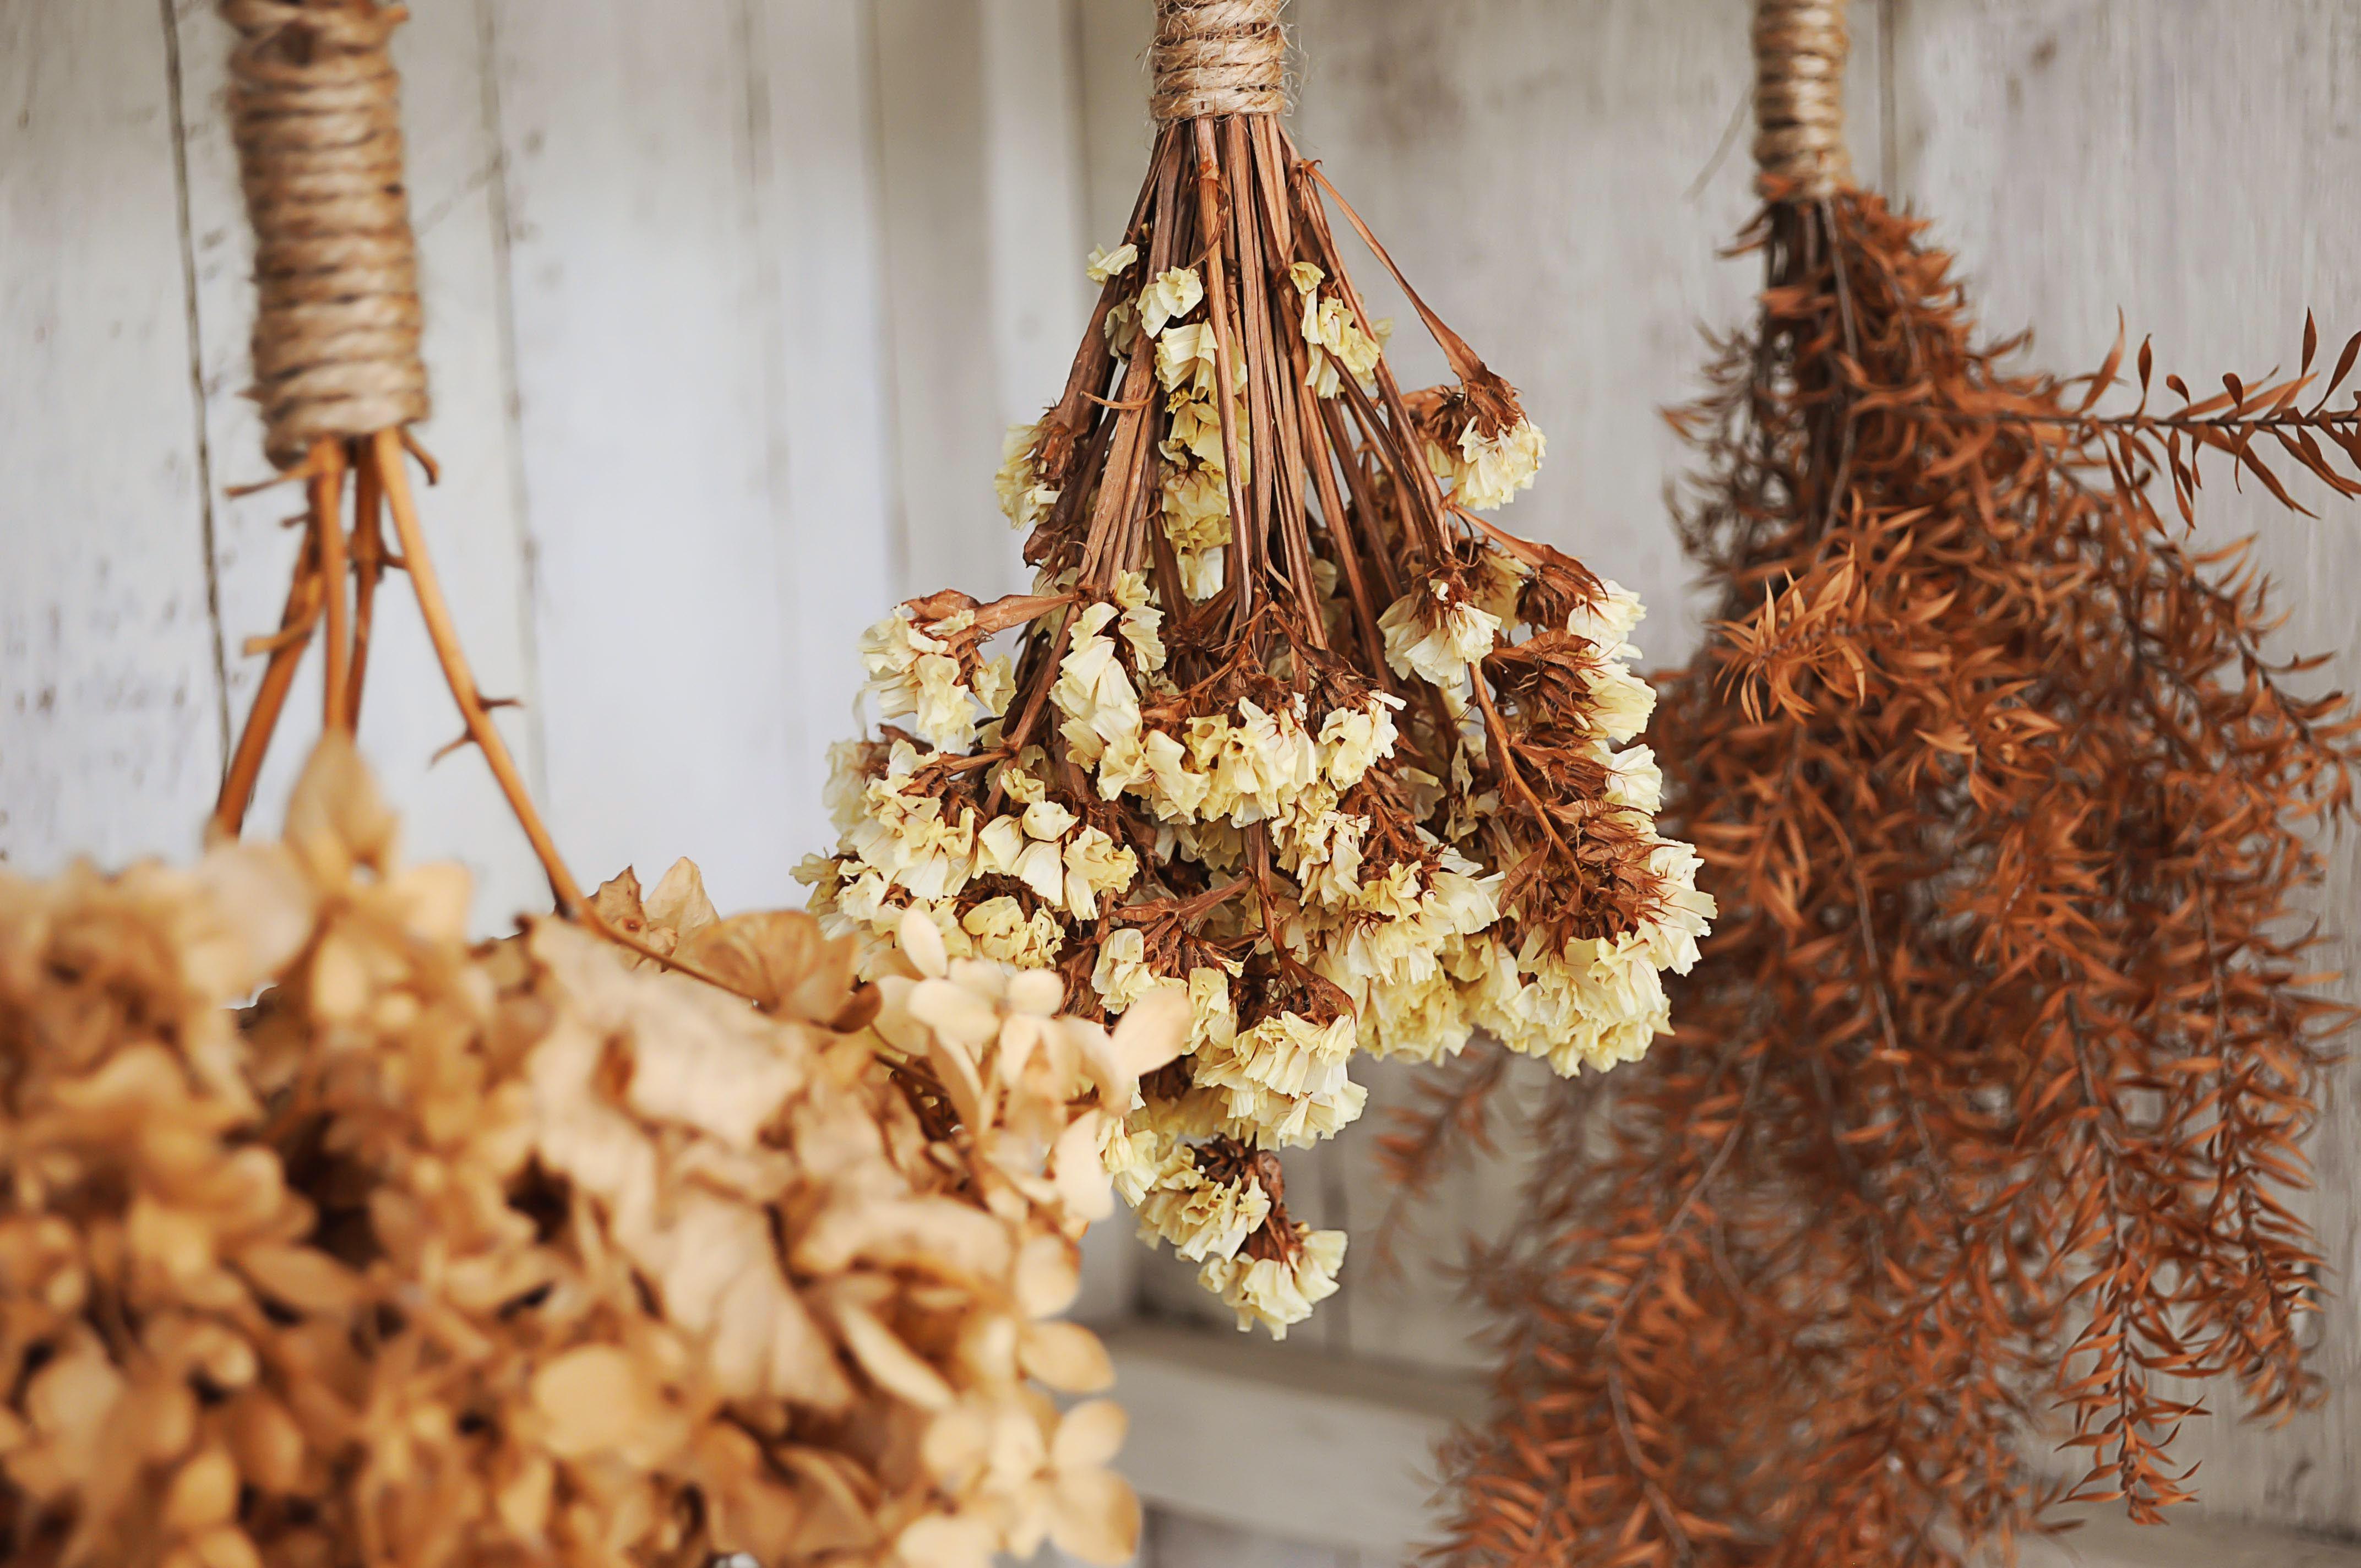 How to dry flowers with laundry borax izmirmasajfo